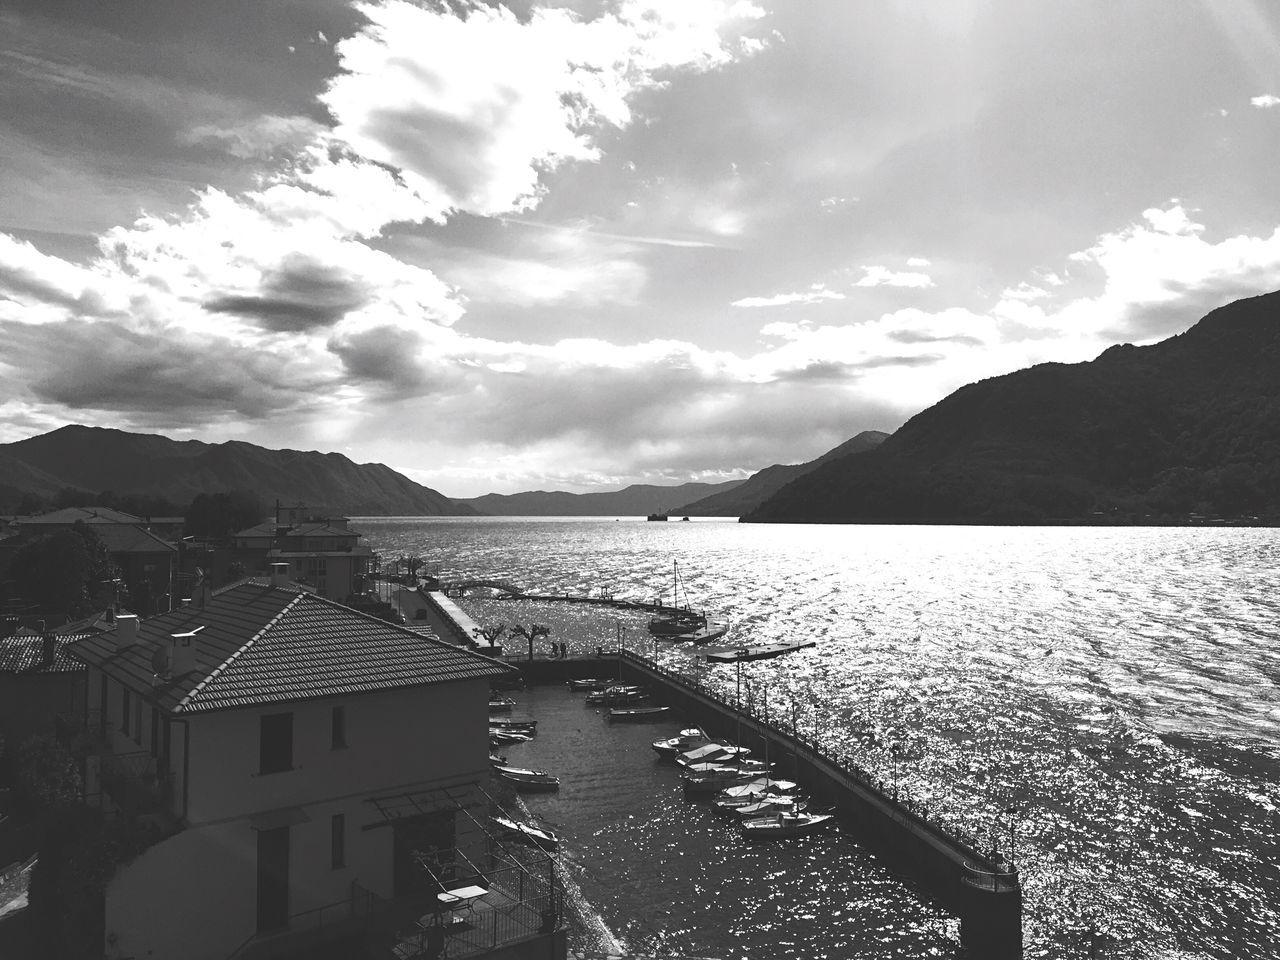 Maccagno Lake Lagomaggiore Blackandwhite Wind Sun Weekend Spring Harbour April